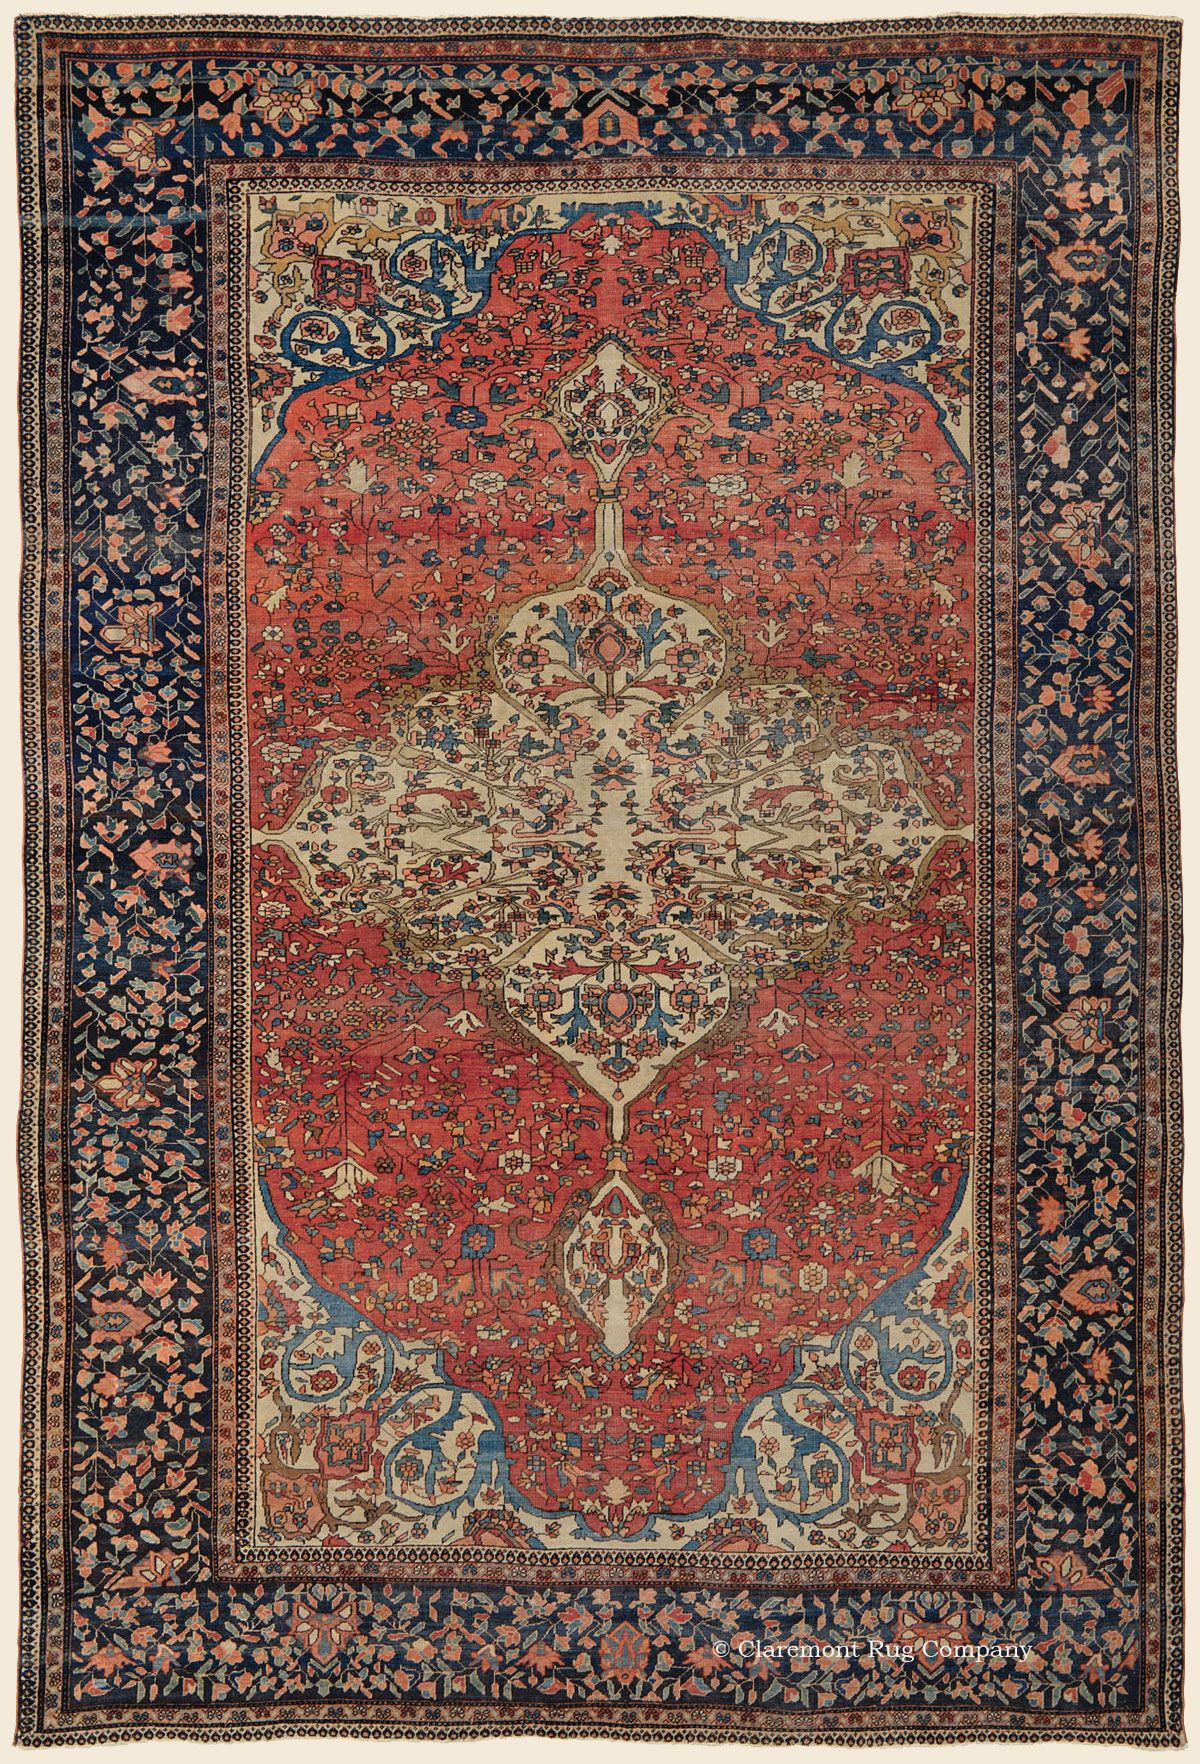 Ferahan Sarouk 6 8 X 9 11 Circa 1850 West Central Persian Antique Rug Claremont Rug Company Rugs Antique Persian Carpet Persian Carpet